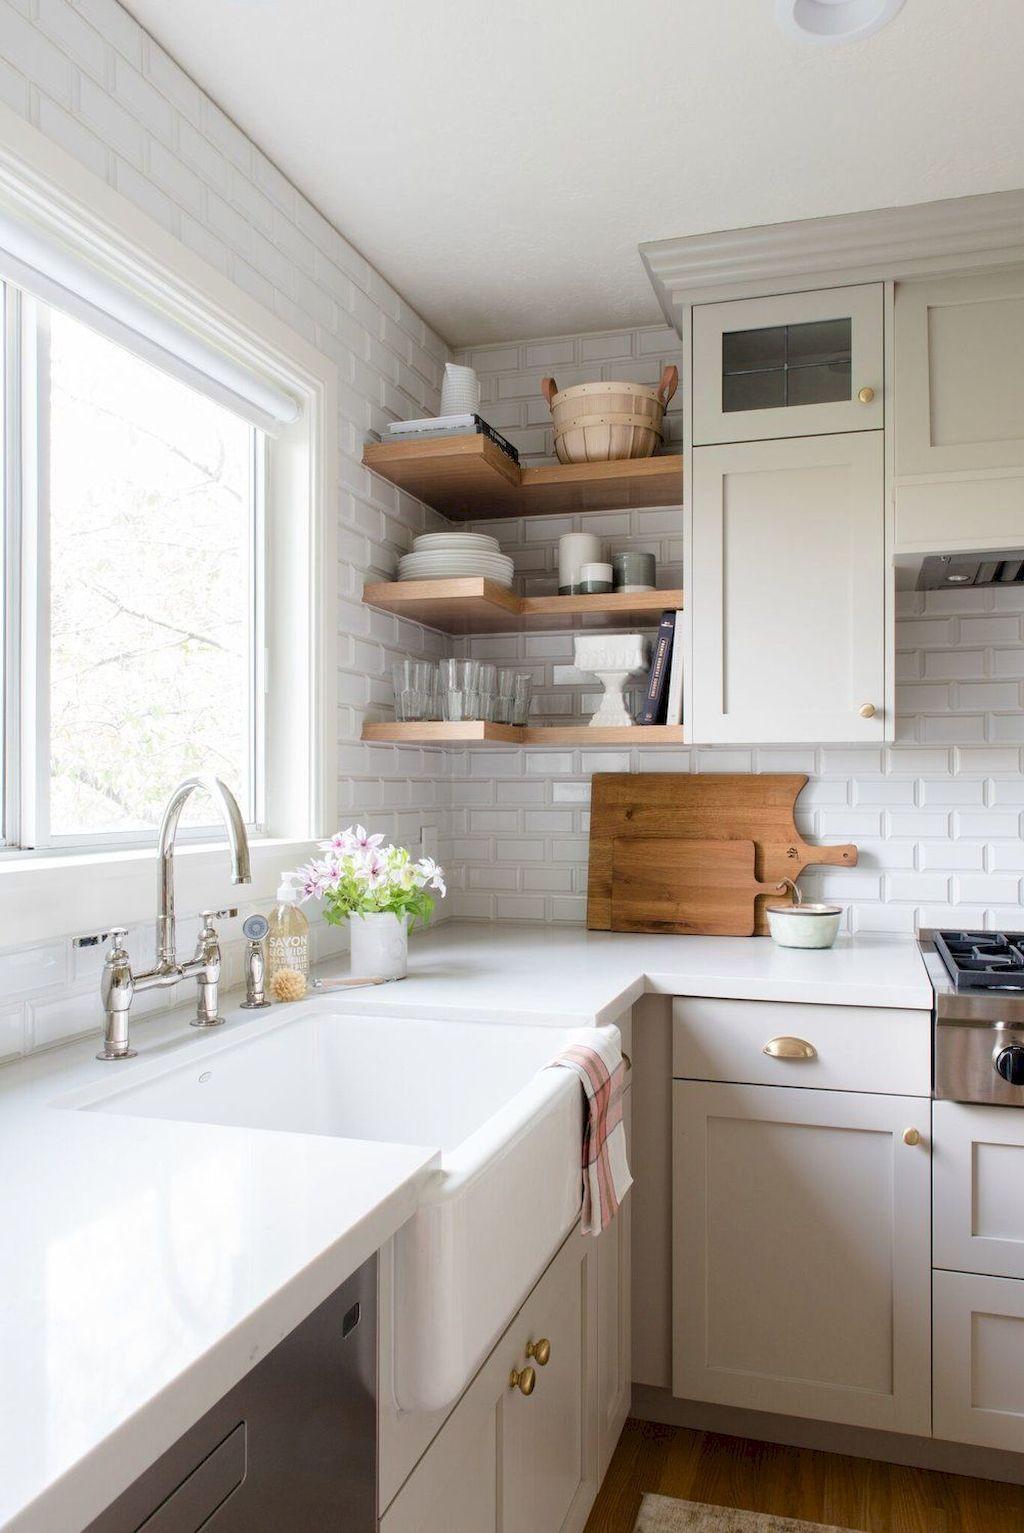 Basic kitchen cabinets  Pin by My Info on dream house  Pinterest  Kitchen remodel Kitchen